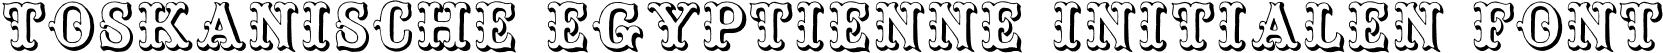 Toskanische Egyptienne Initialen Font